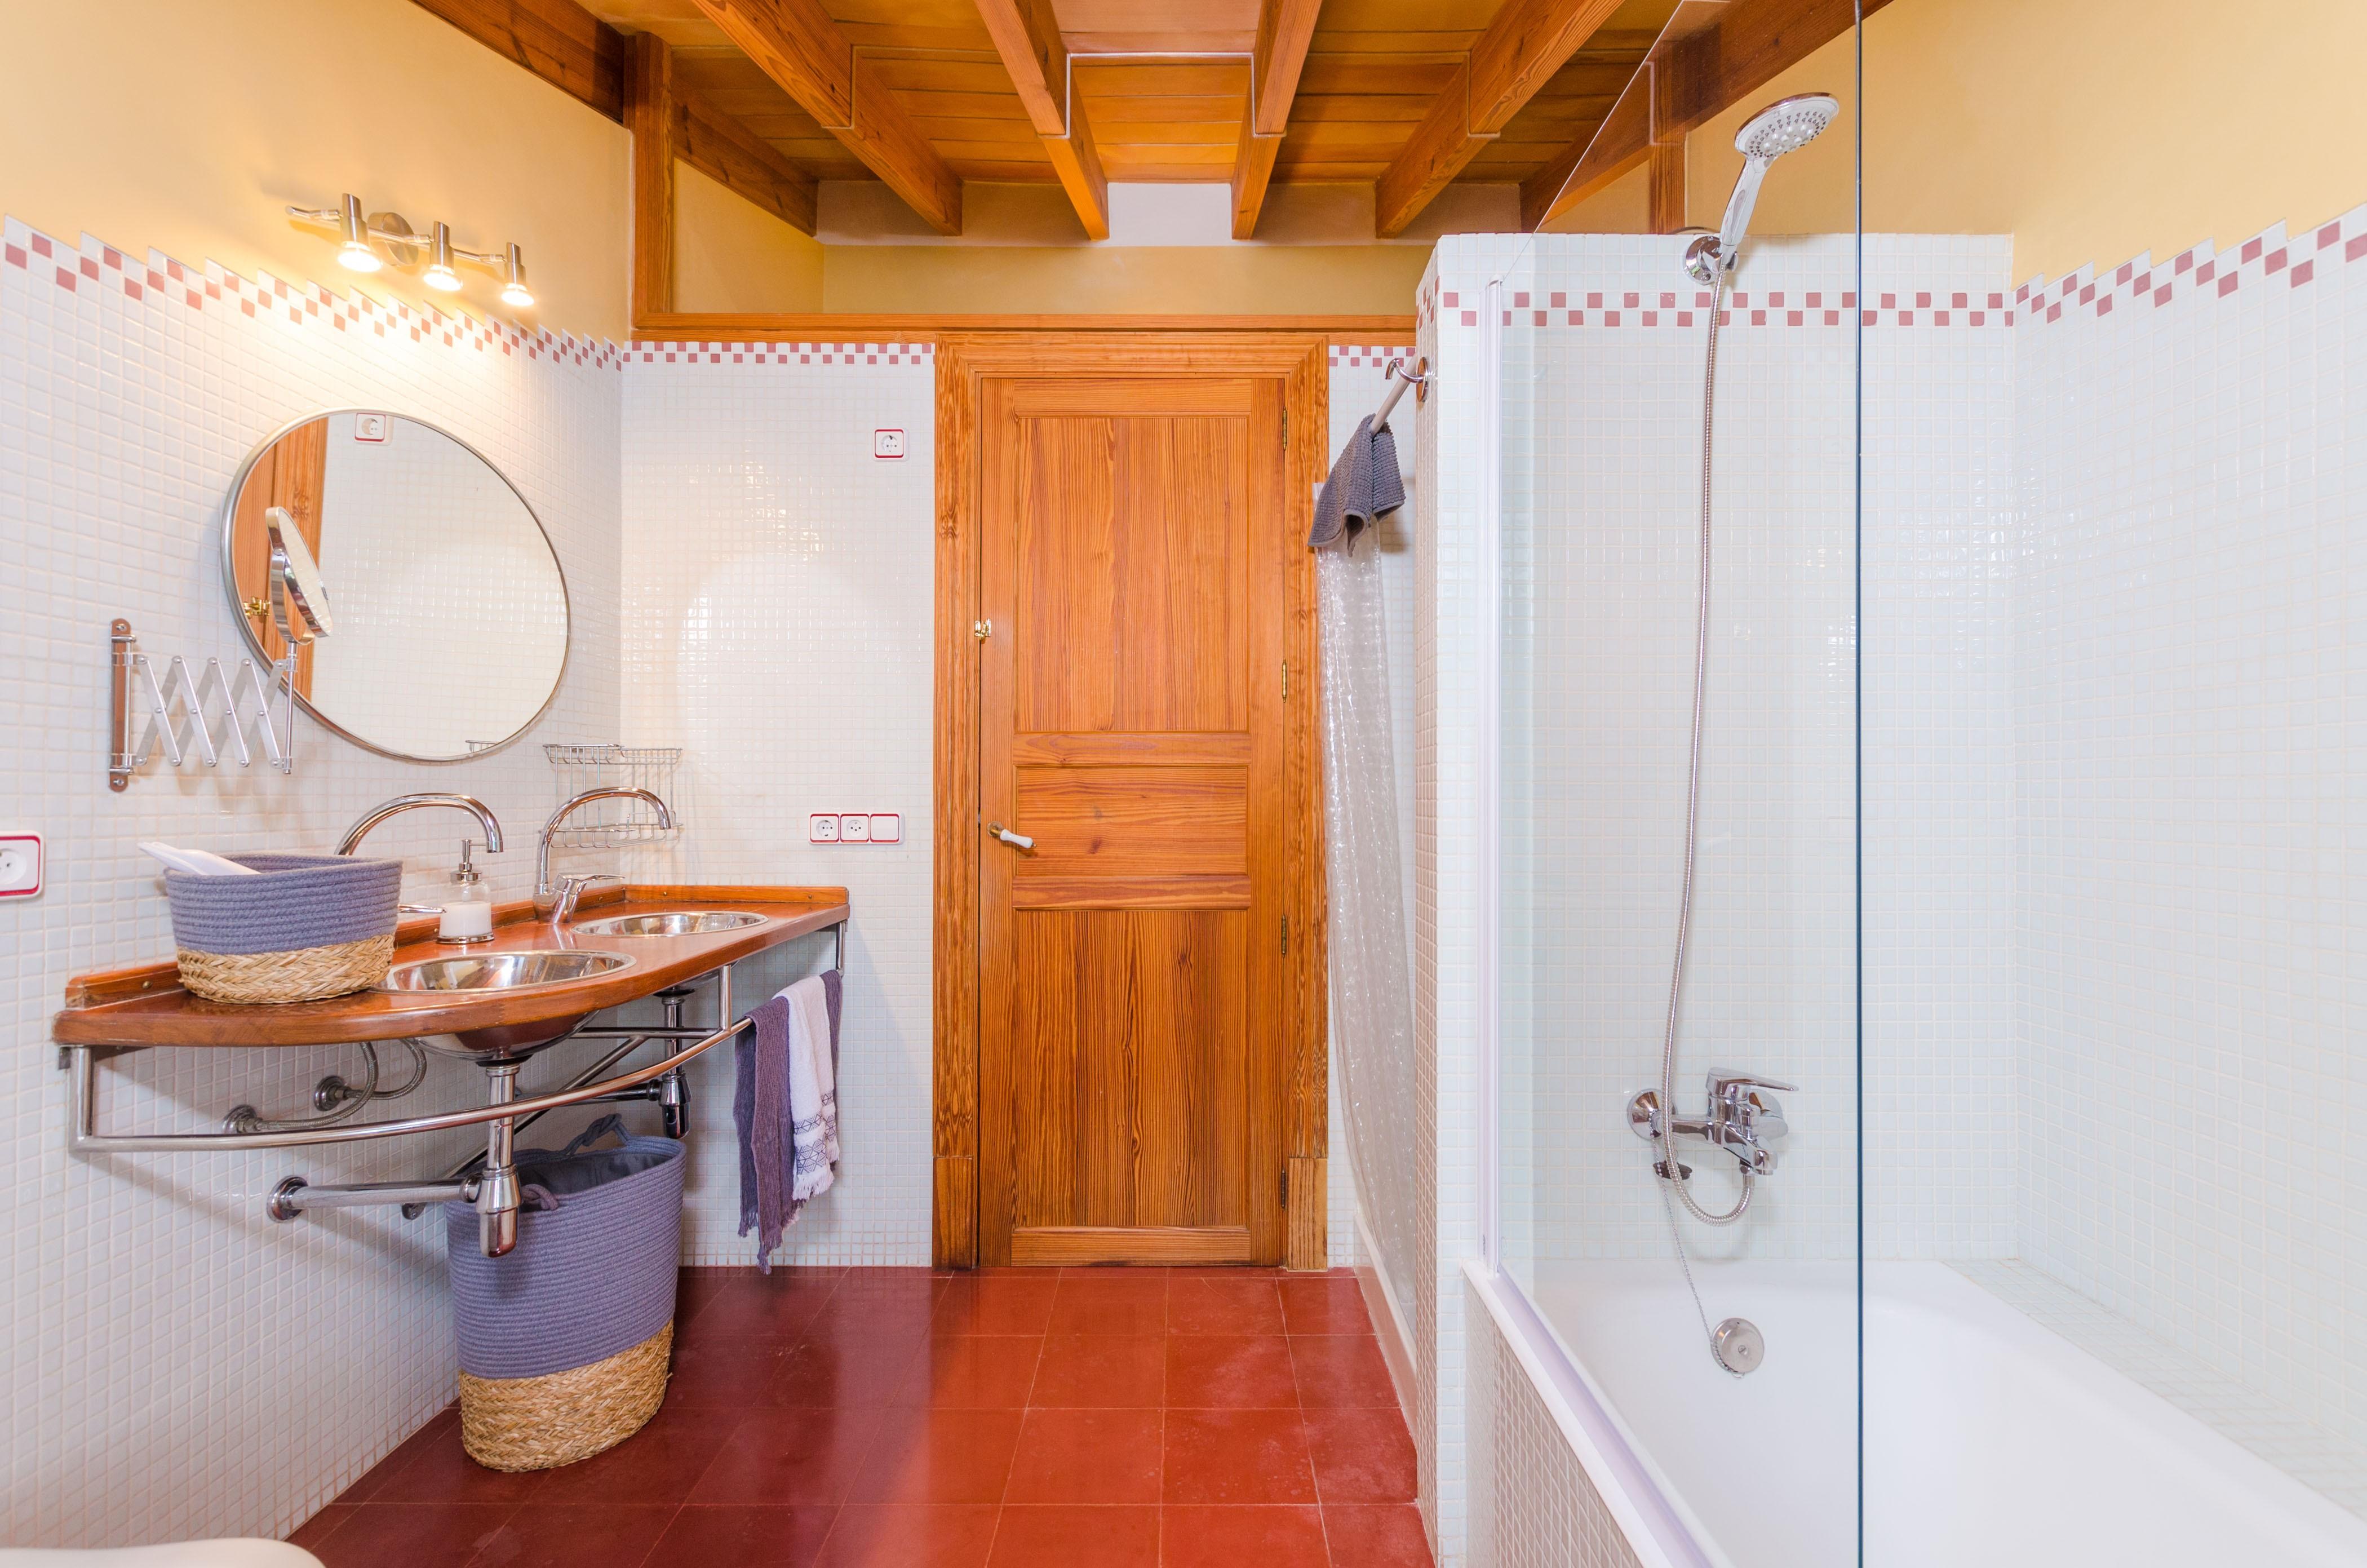 Maison de vacances CAS CONVIDATS (2435013), Alaro, Majorque, Iles Baléares, Espagne, image 55